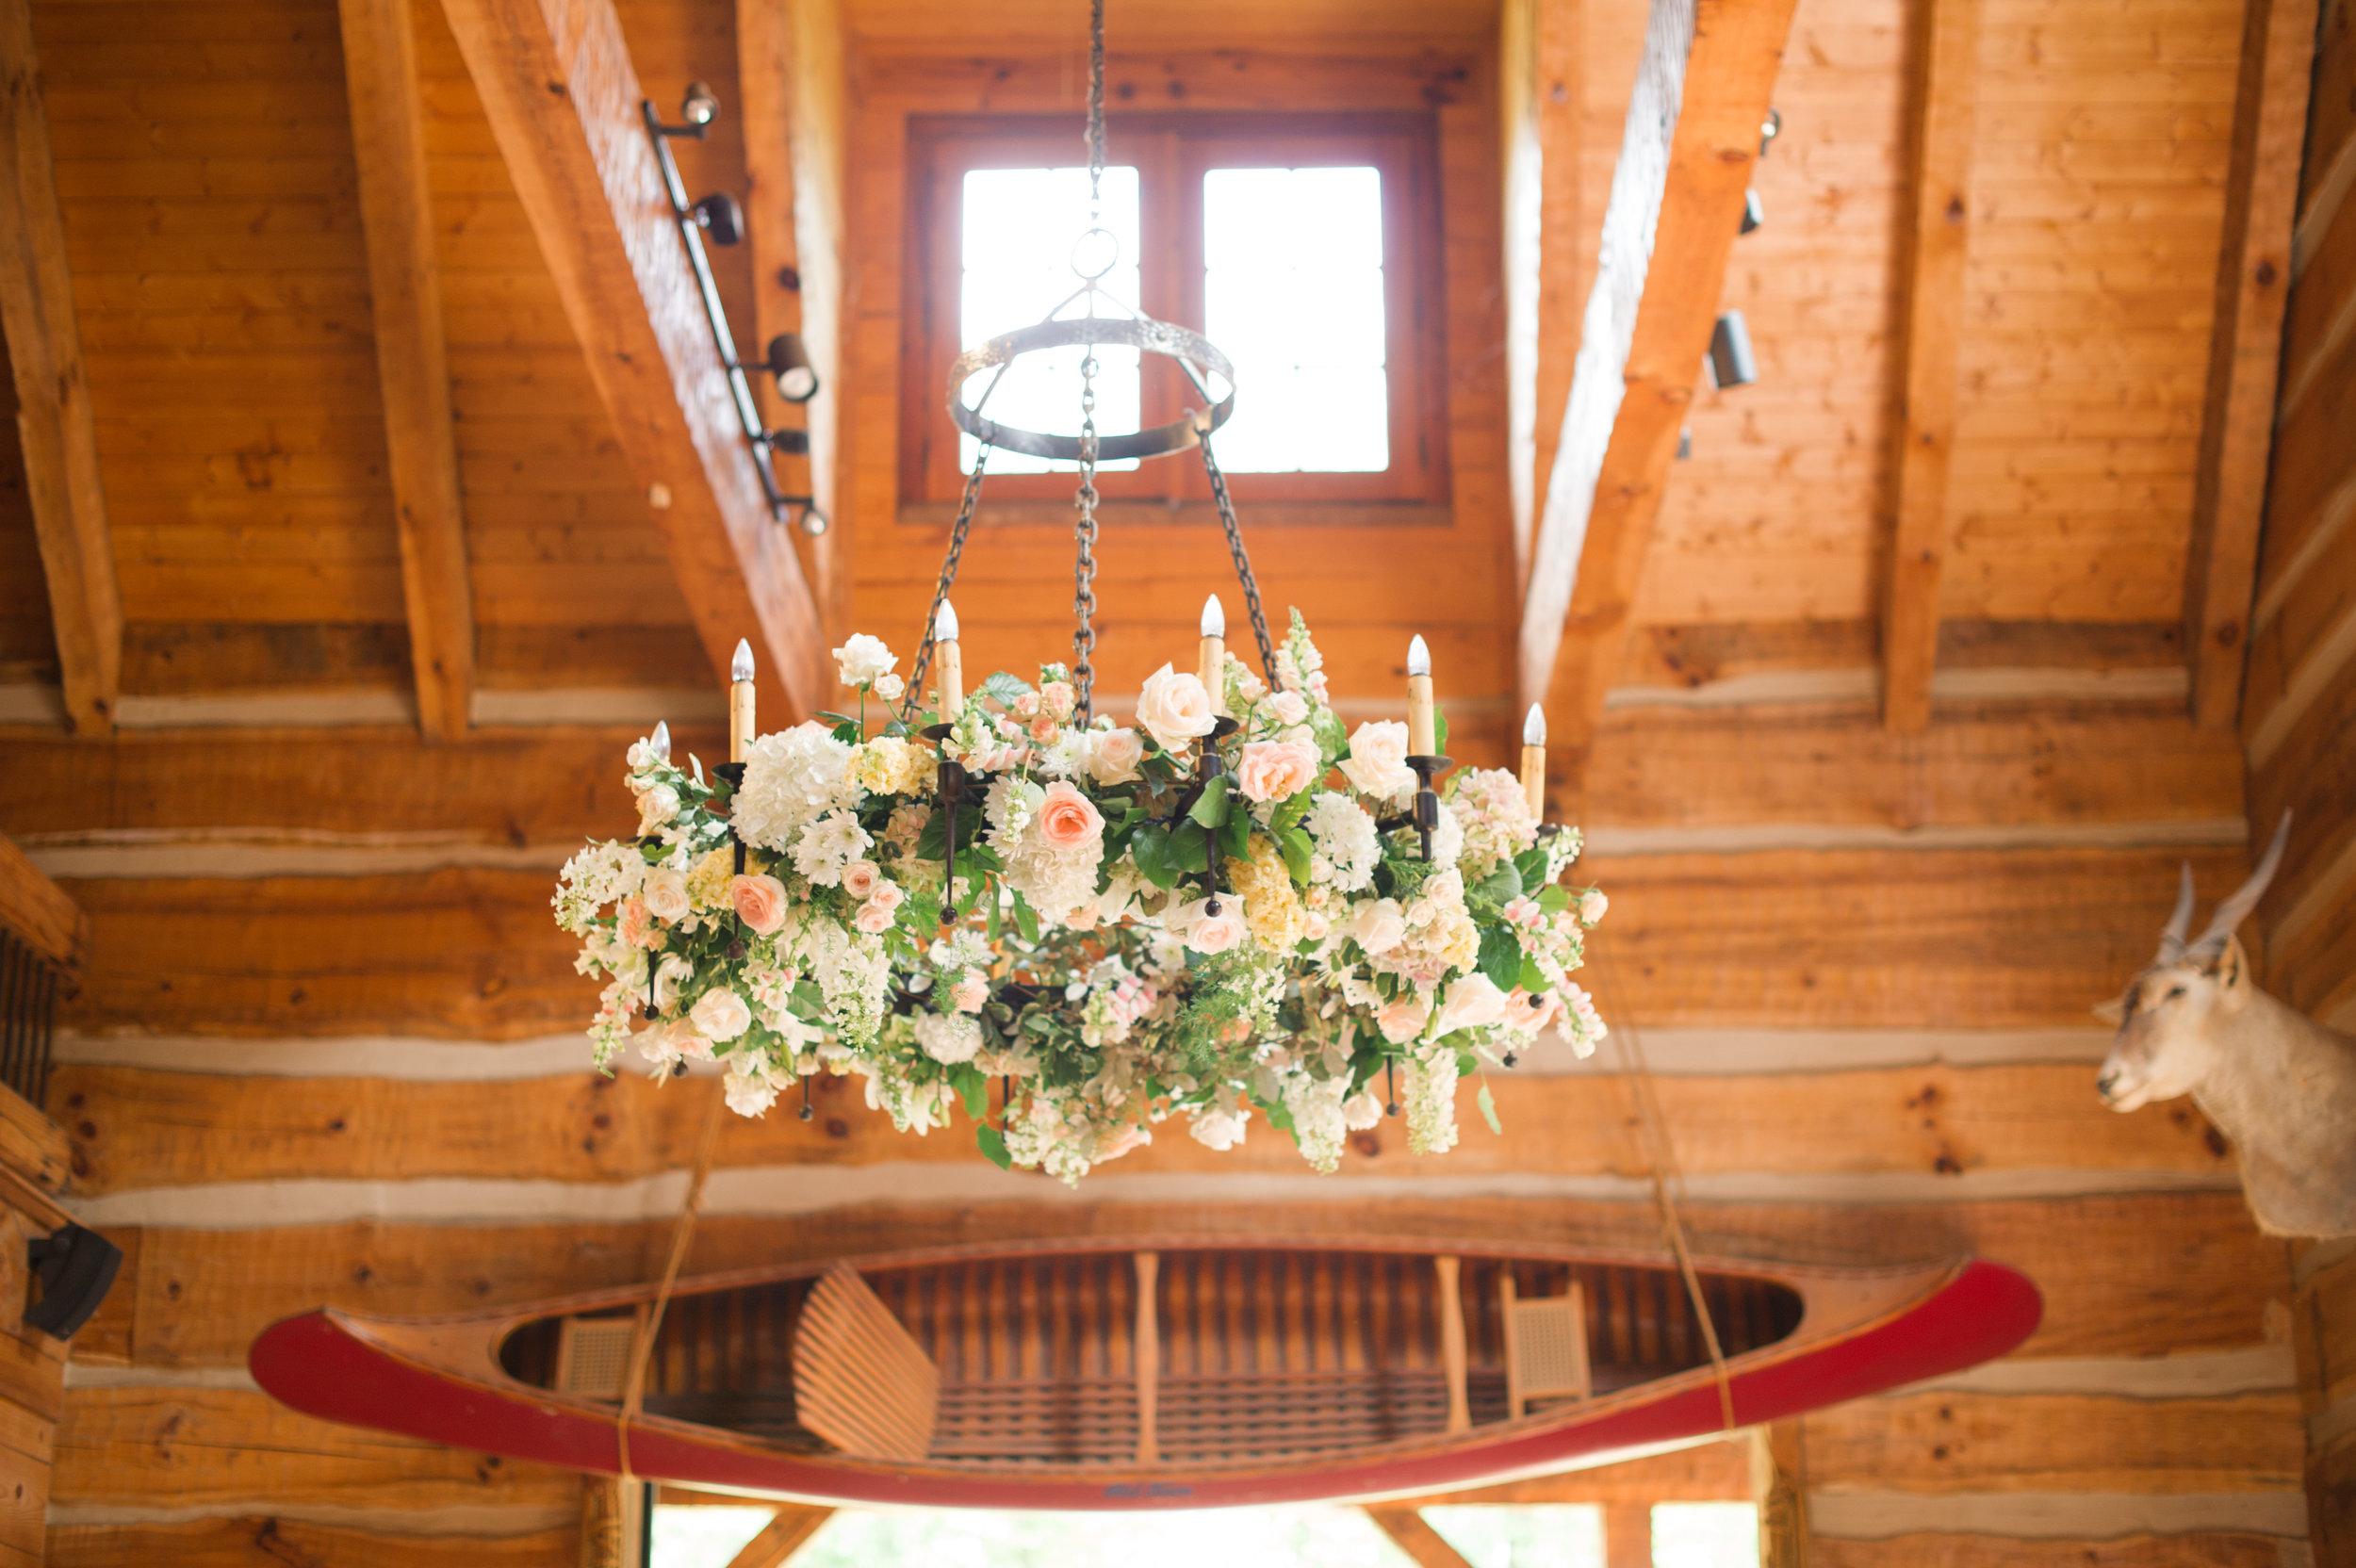 Handley Breaux Designs | Alabama Wedding Planner | Southern Wedding Planner | Barn Wedding | Jess & Ben | Spindle Photography